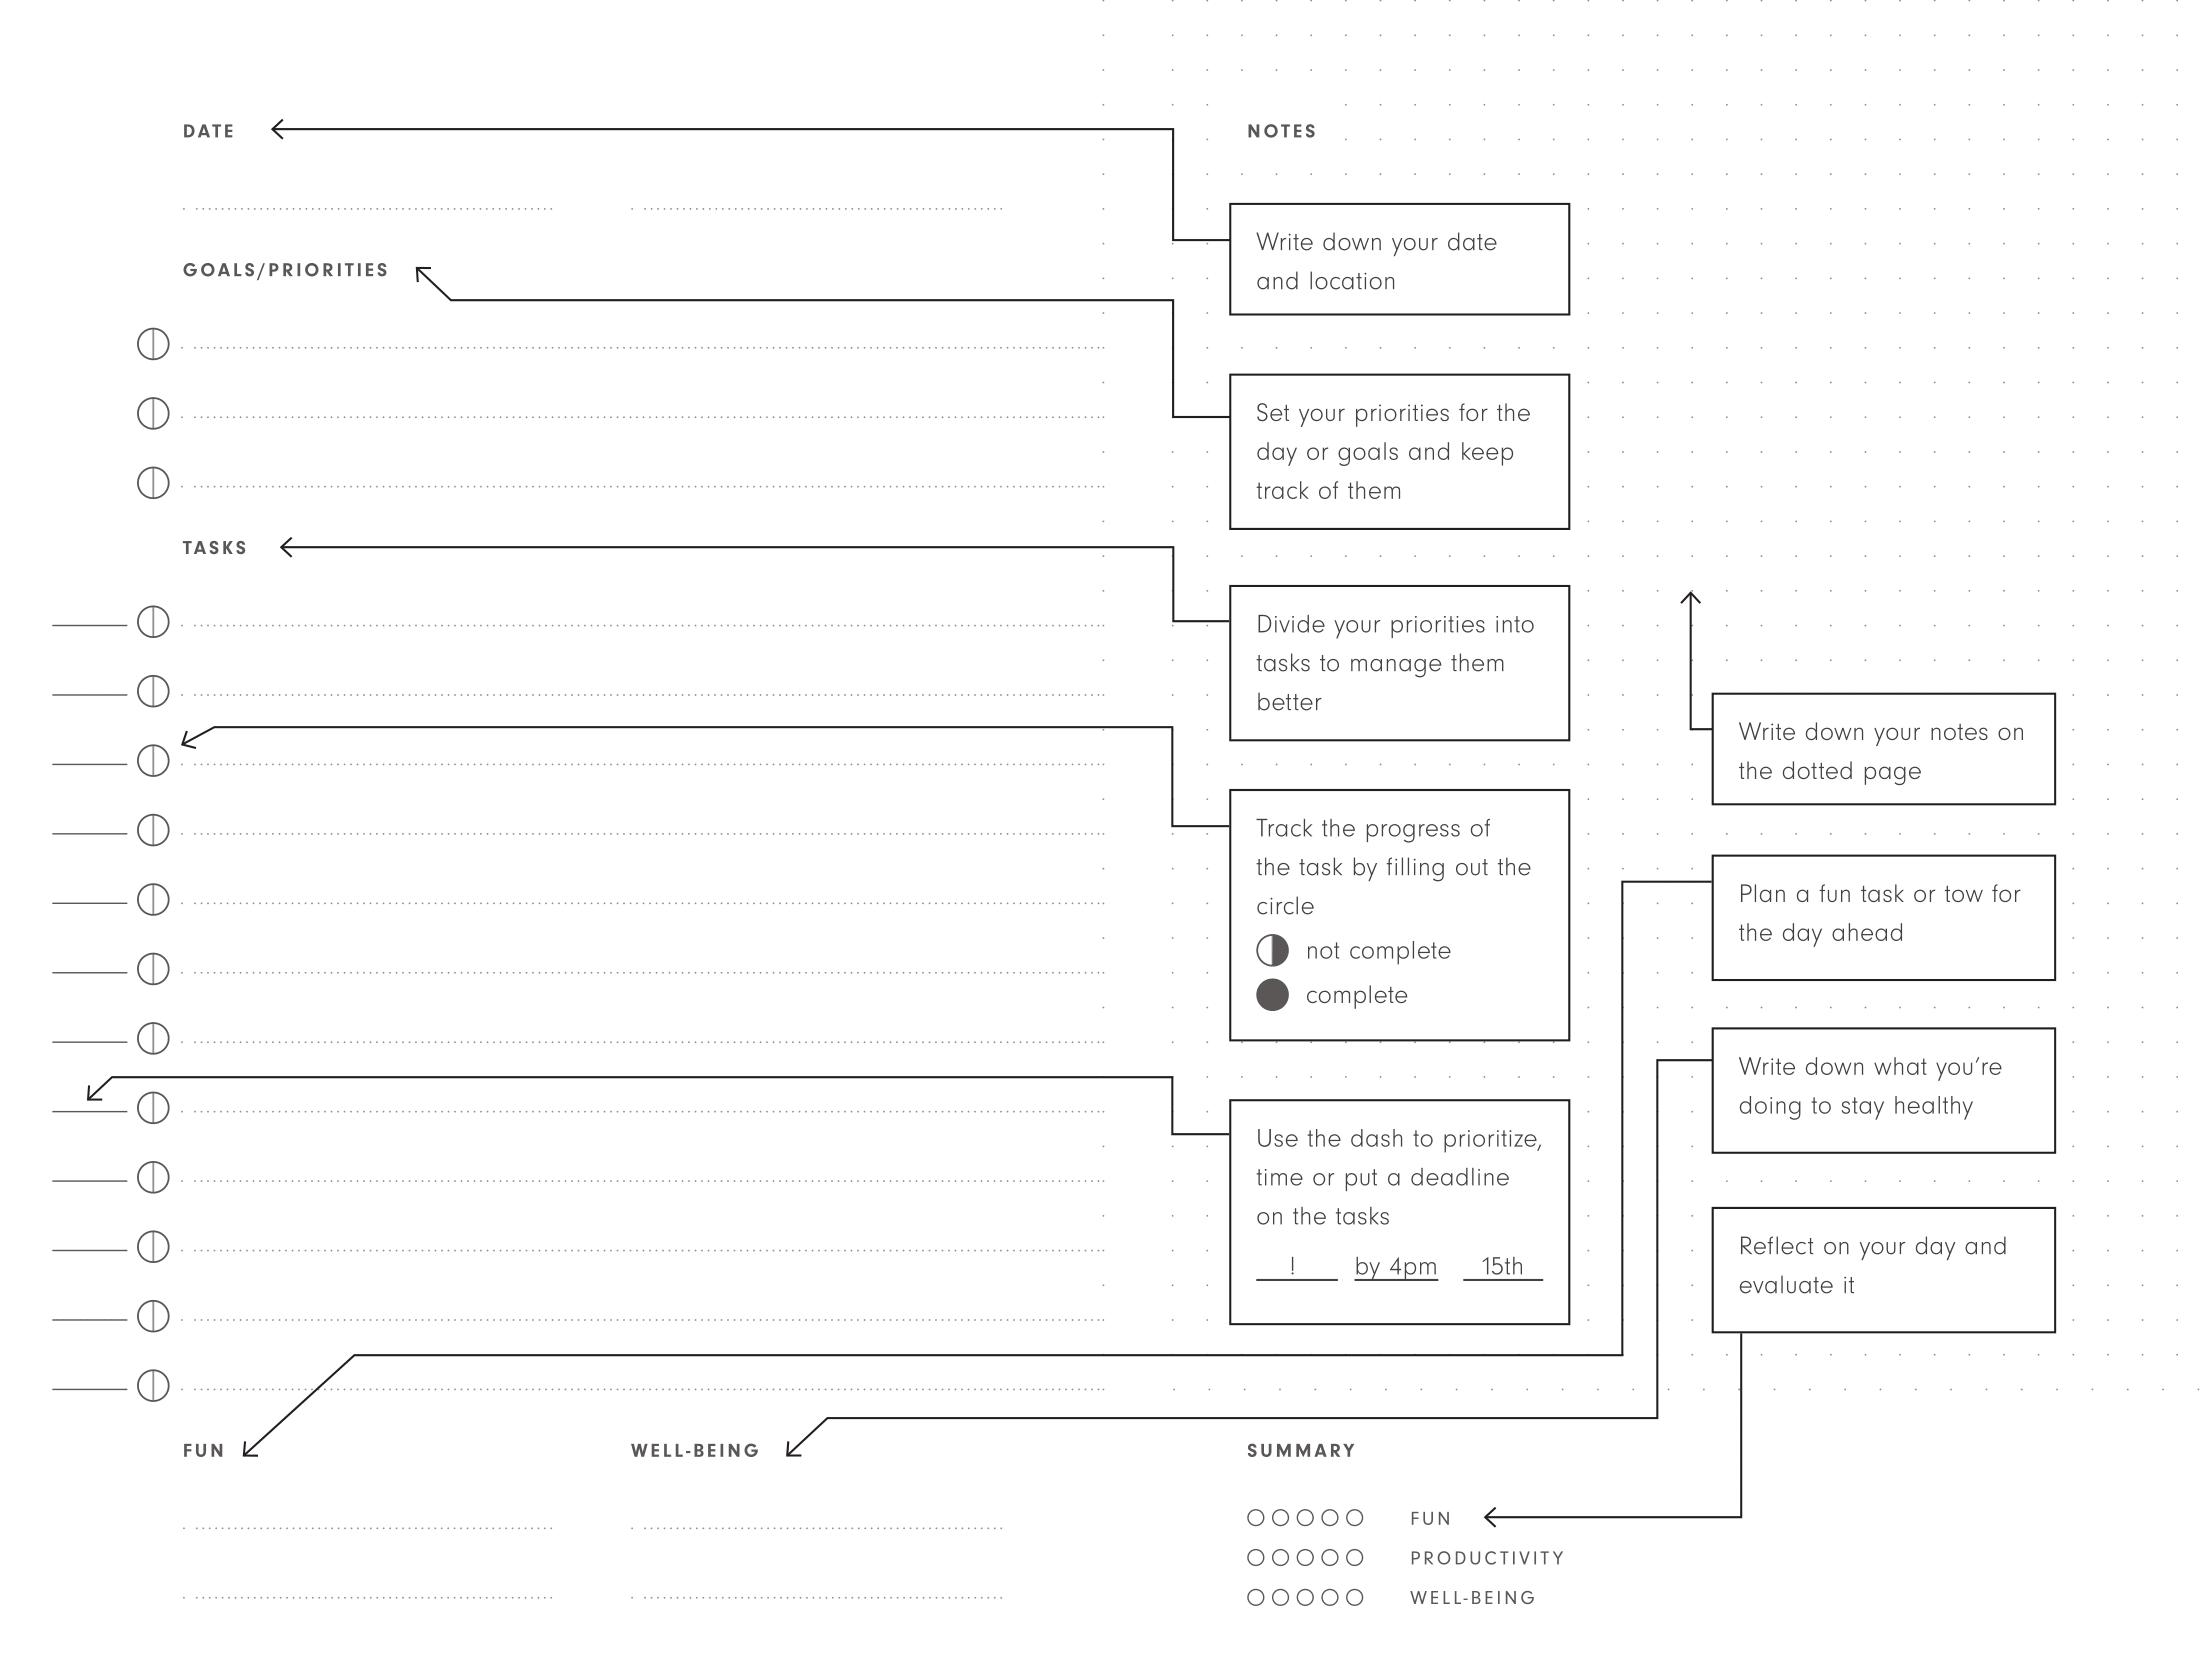 SamplePage interation 1-1